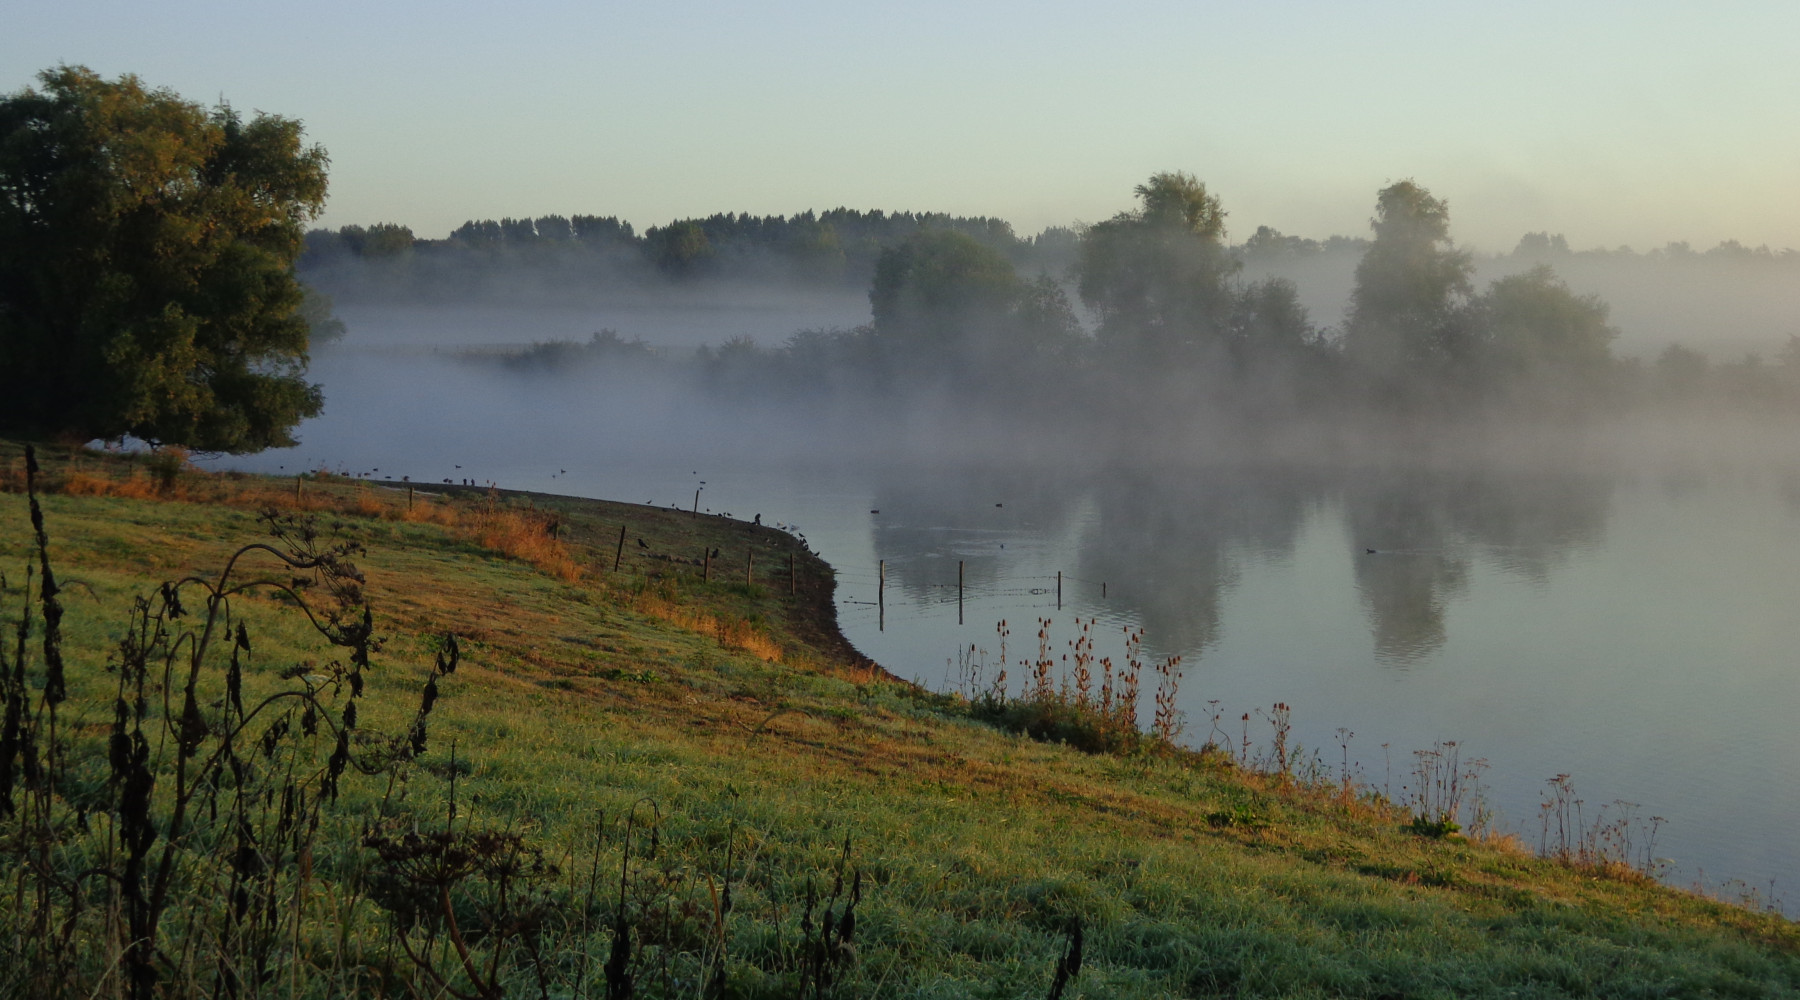 Mist over de Maas Oktober 2016 - 1